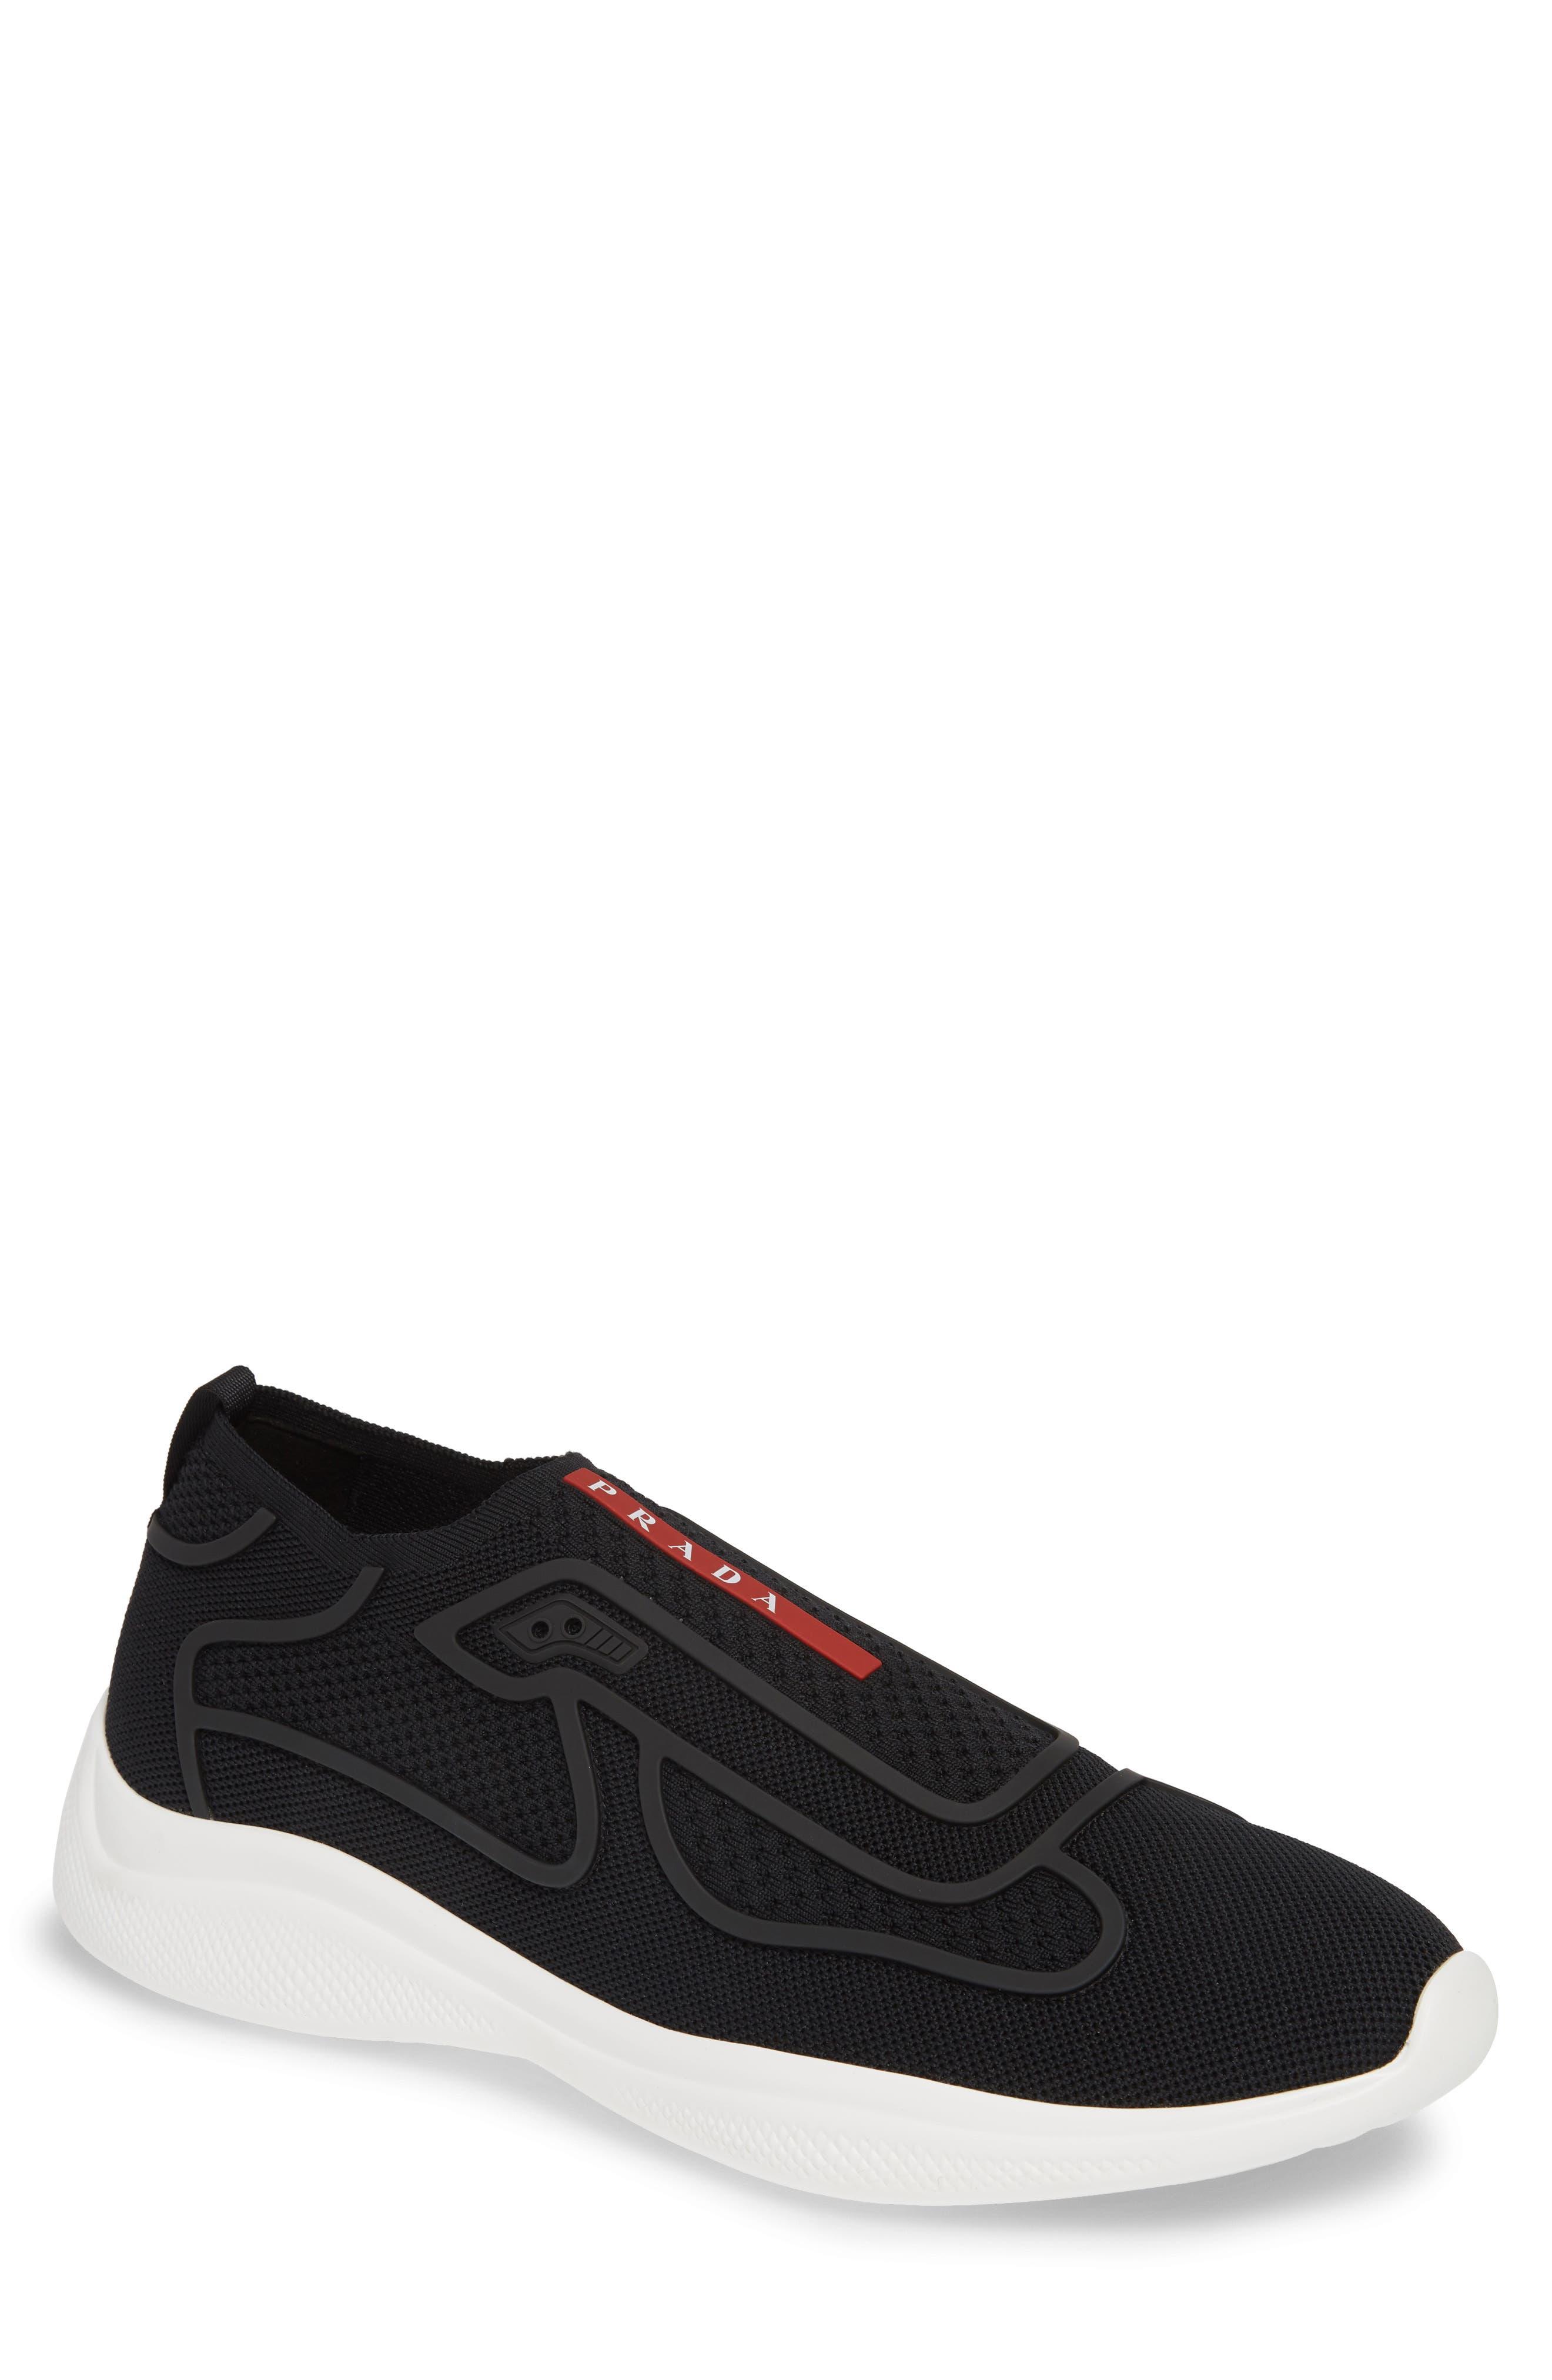 PRADA Laceless Logo Sneaker, Main, color, NERO